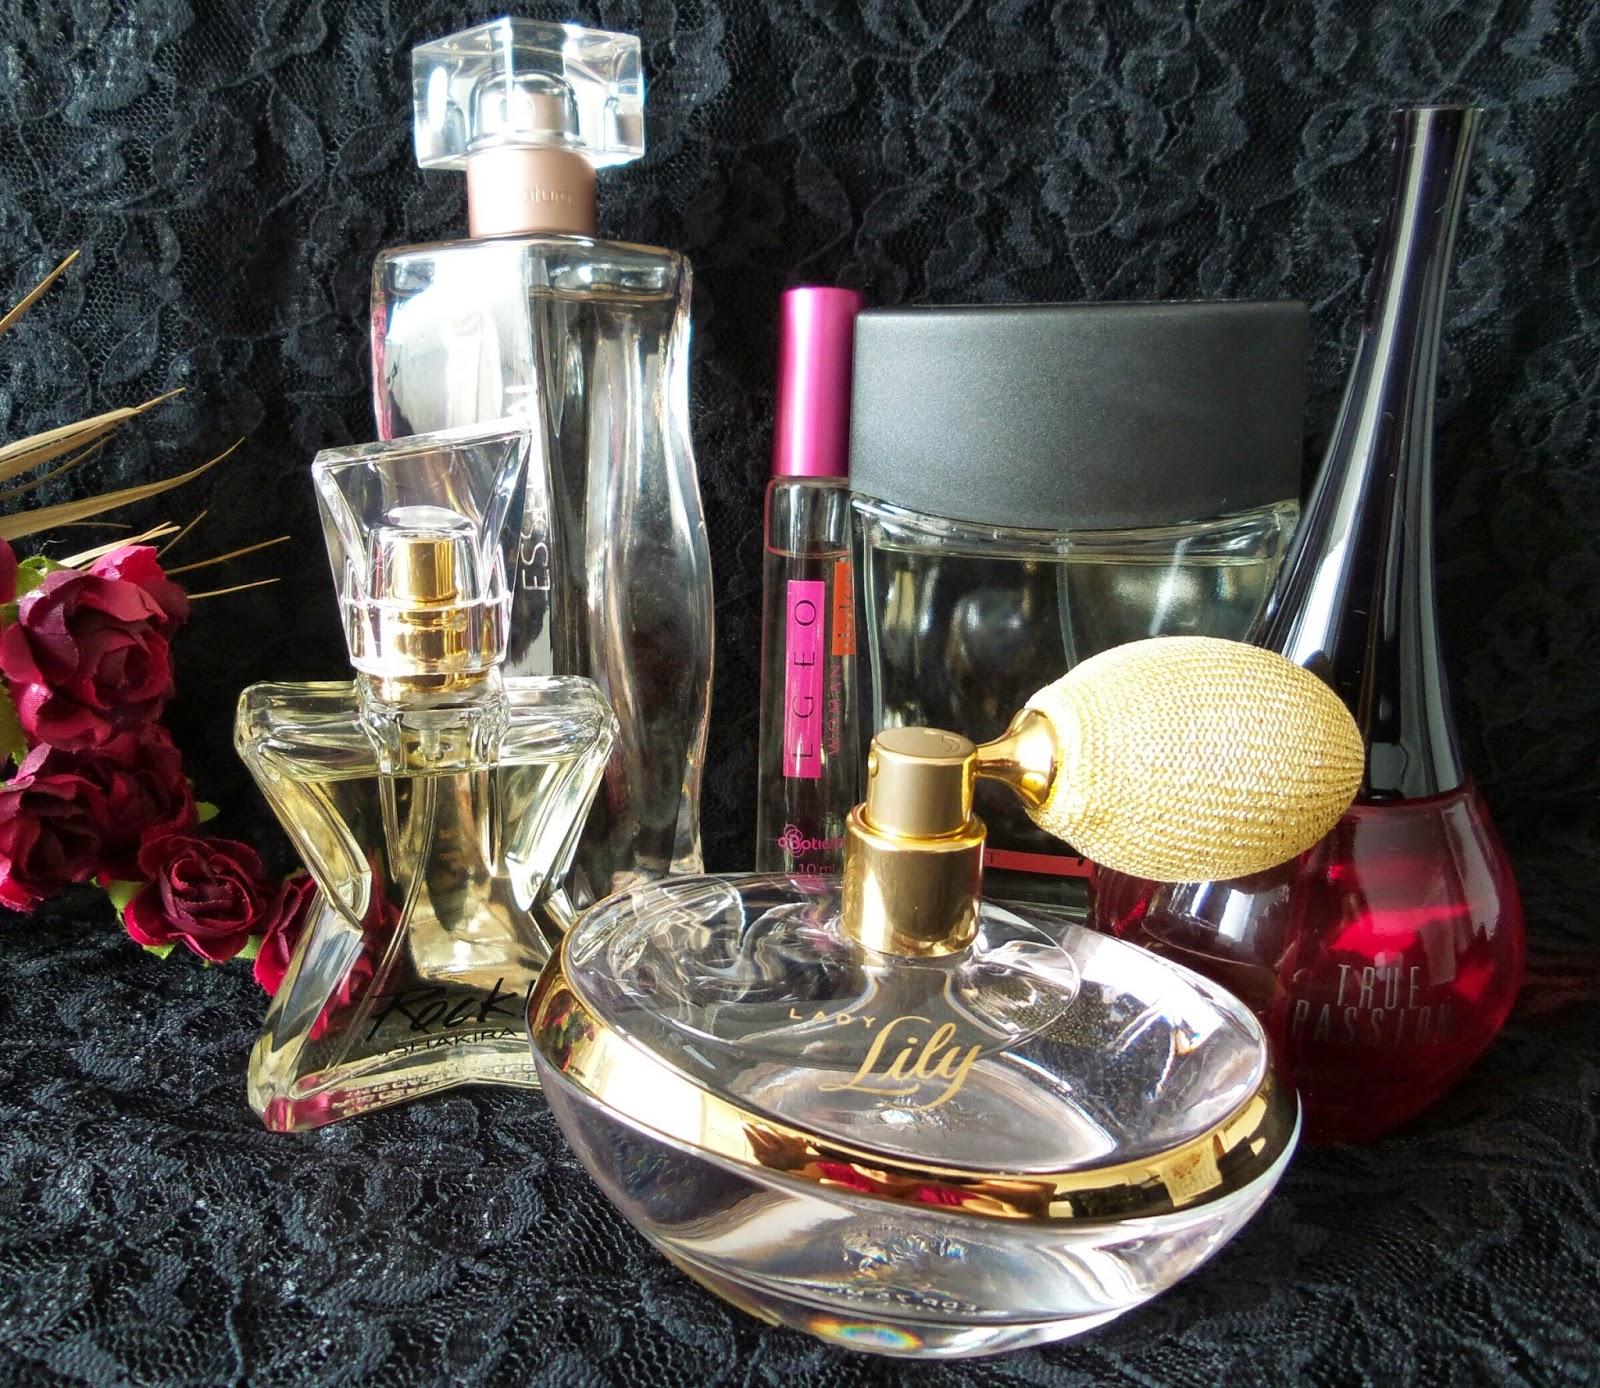 True Passion Mary Kay, Lady Lily, Egeo Dolce O Boticário,Rock  by Shakira, Essencial   Deo Parfum  Natura, Free Spirit Sport Mary Kay